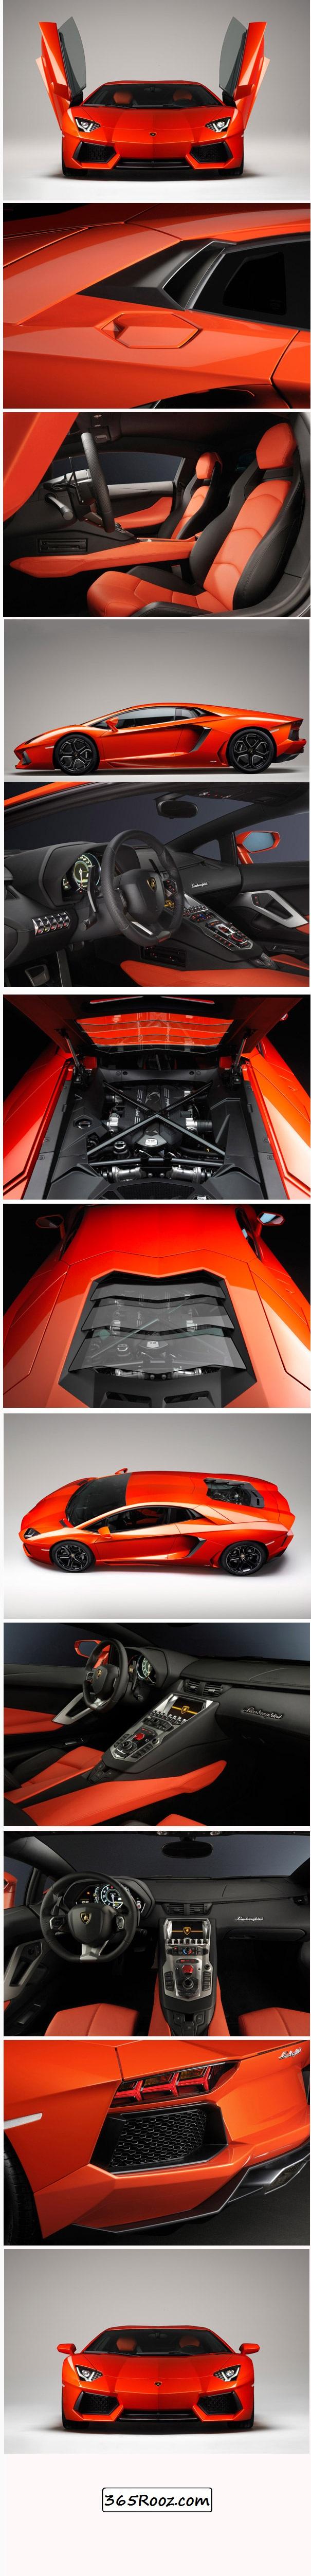 http://s1.picofile.com/file/6831733398/Lamborghini_365rooz_com_01.jpg